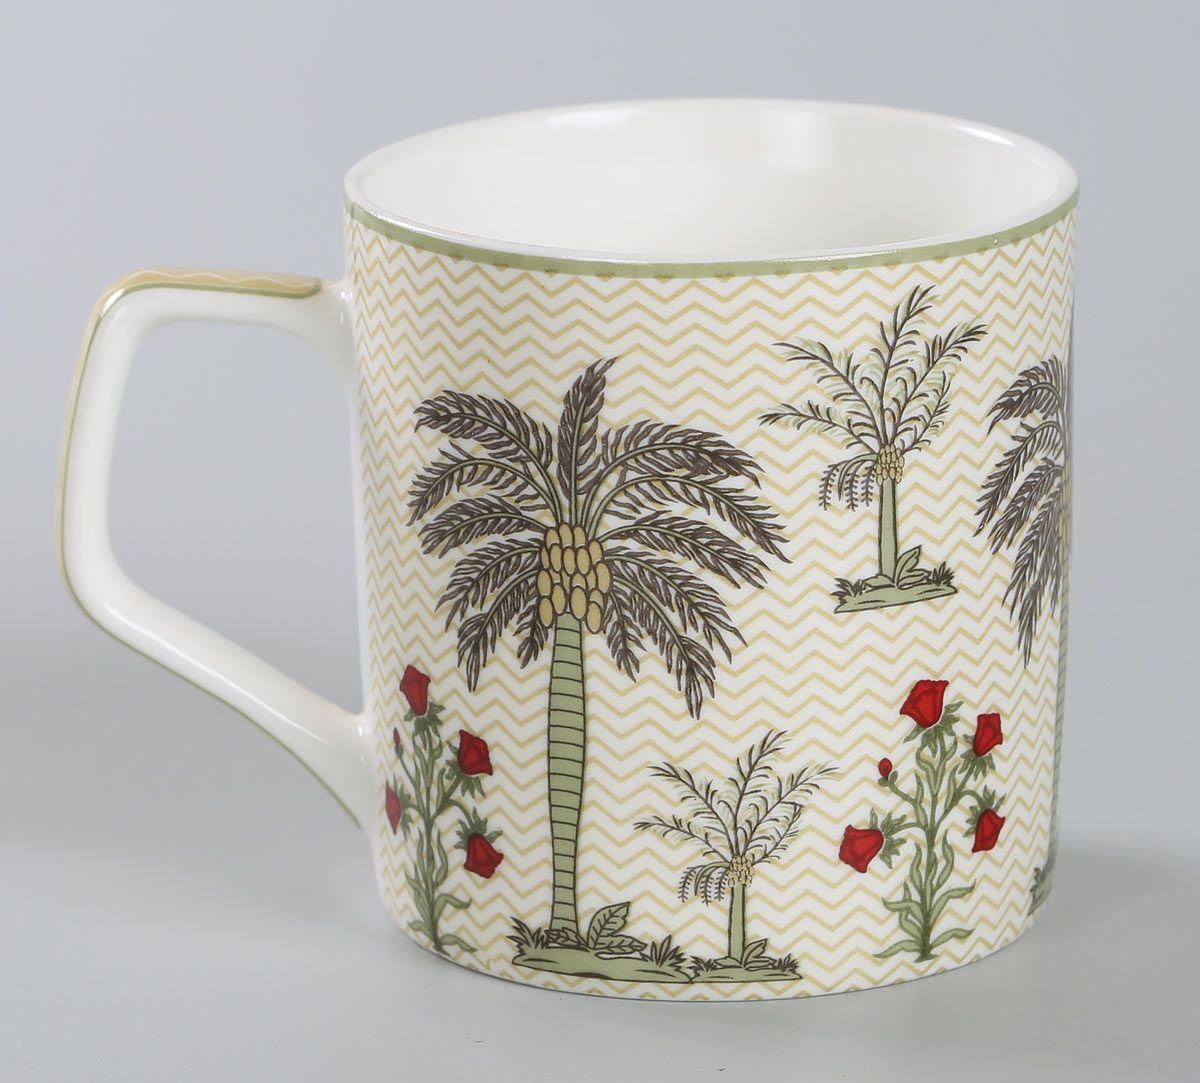 India Circus Chevron Palms Mug Set of 6